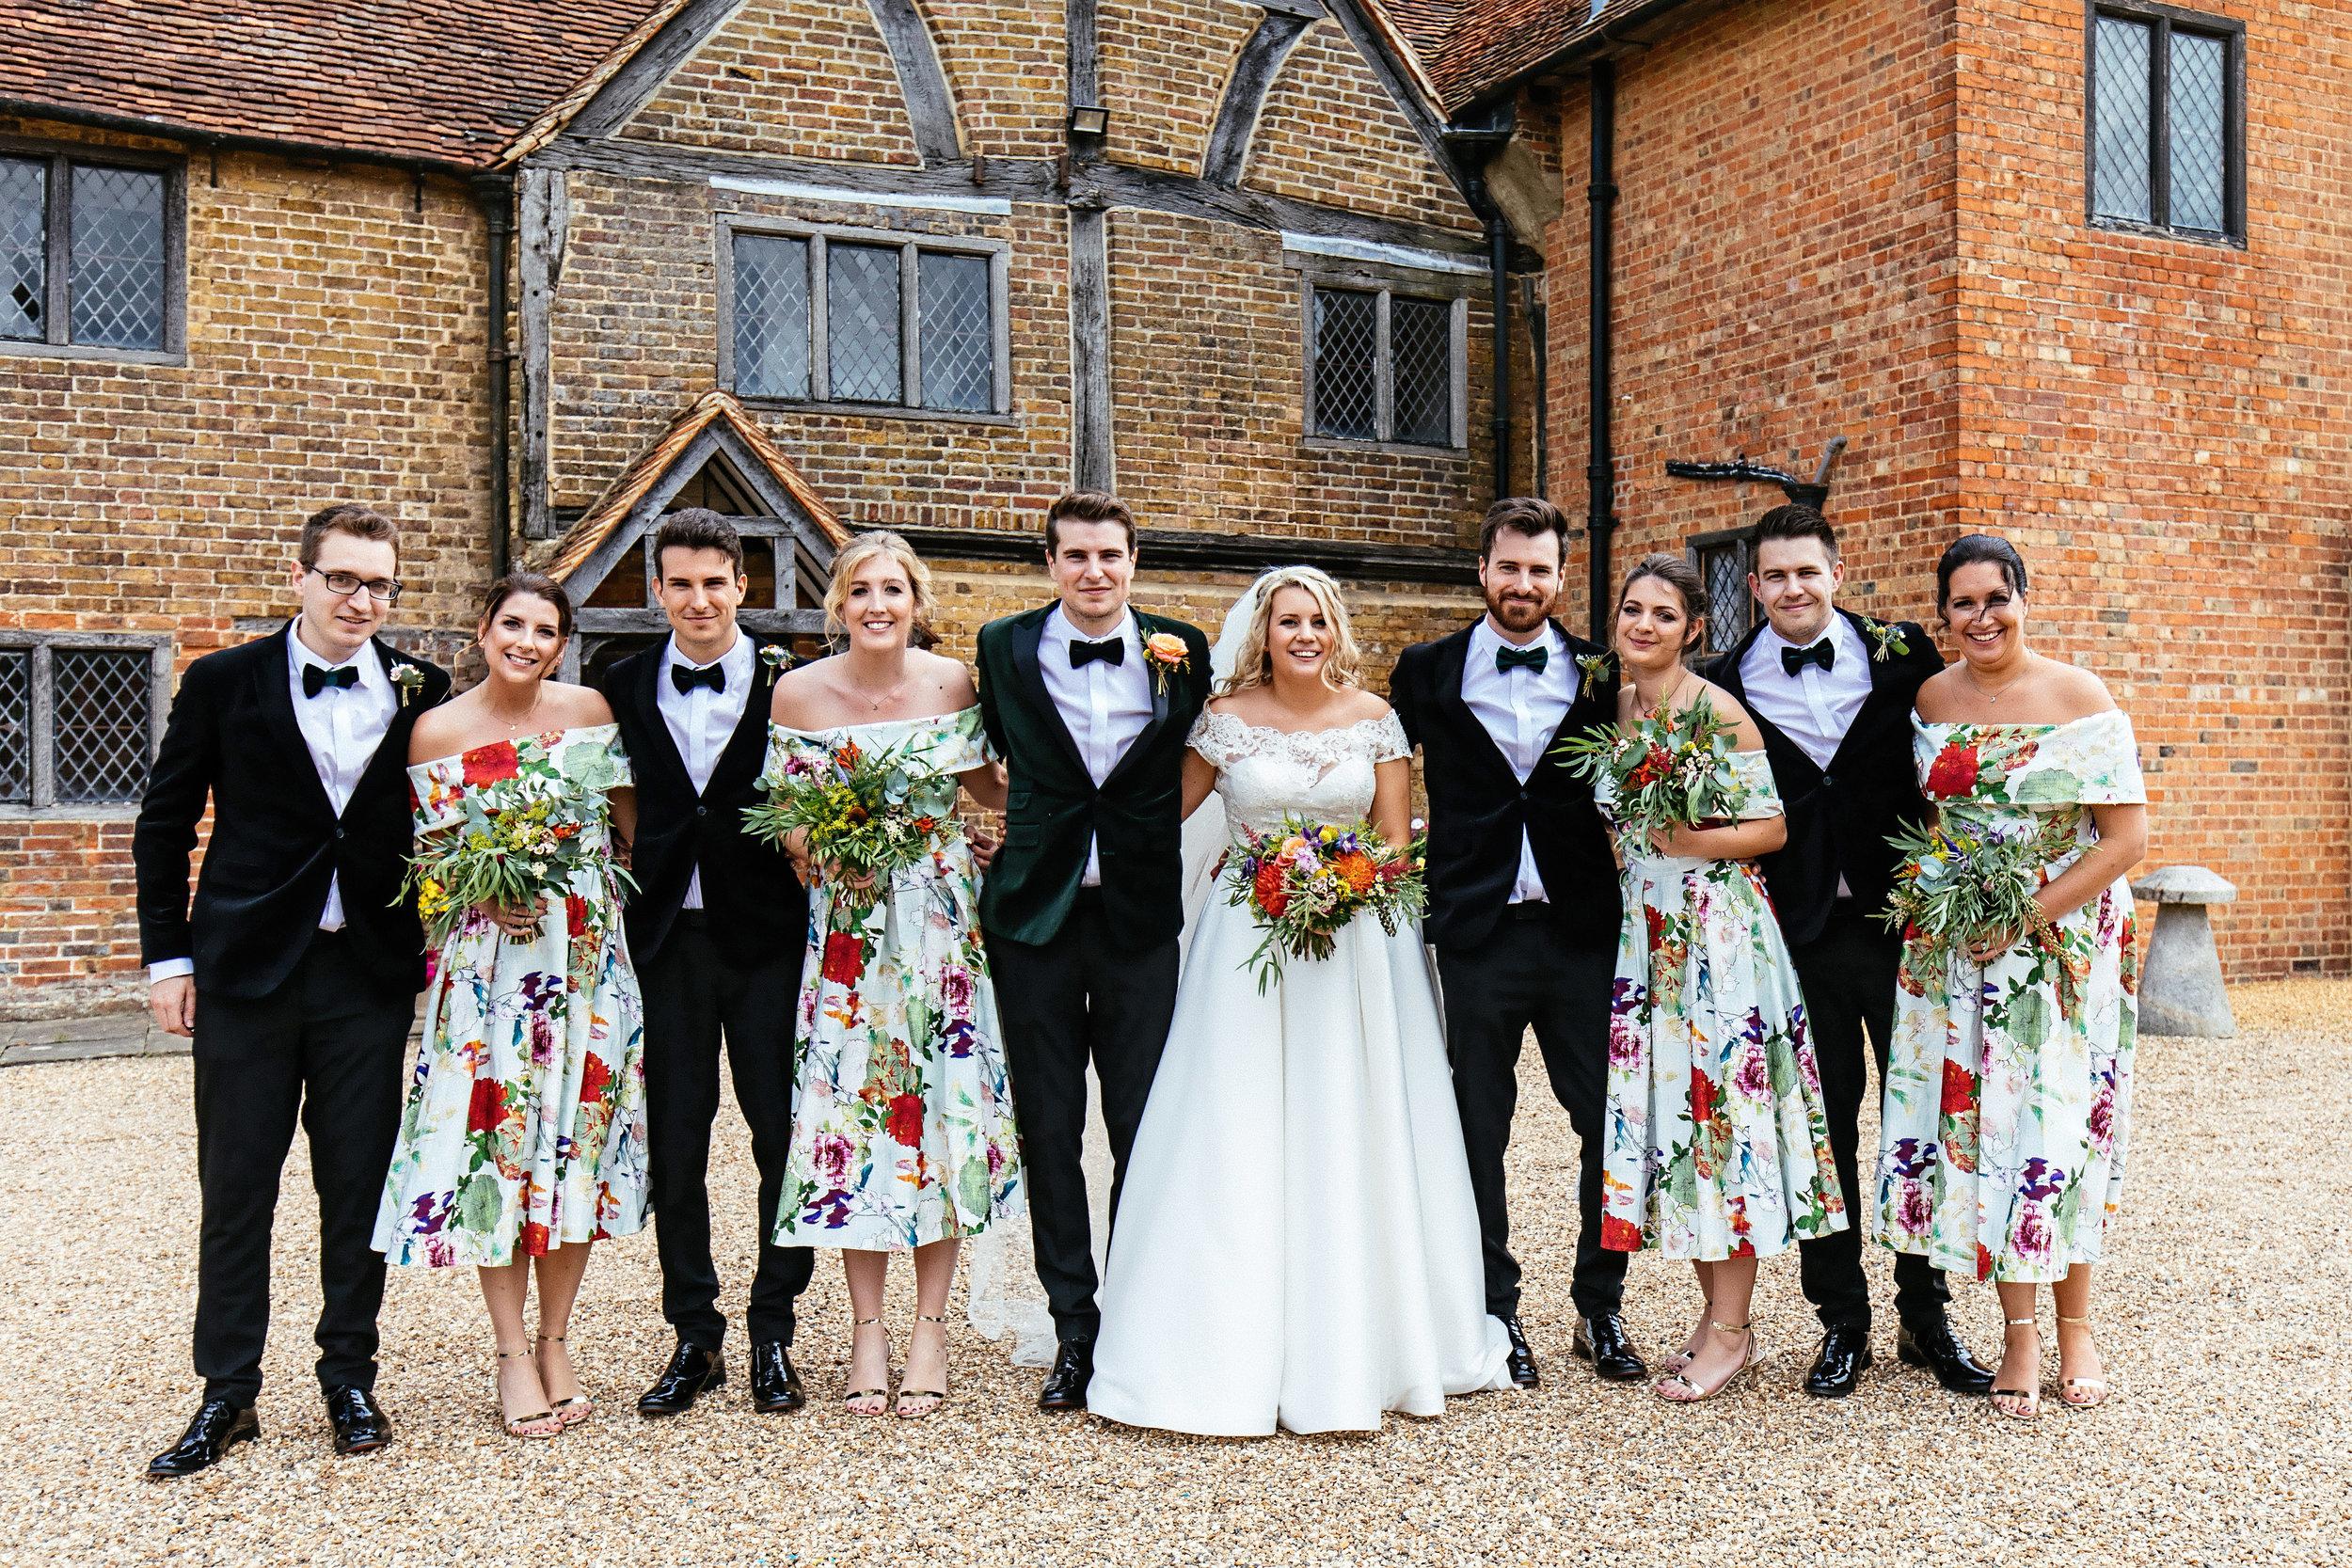 Tamara-and-Richard-Wedding-Highlights-39.jpg